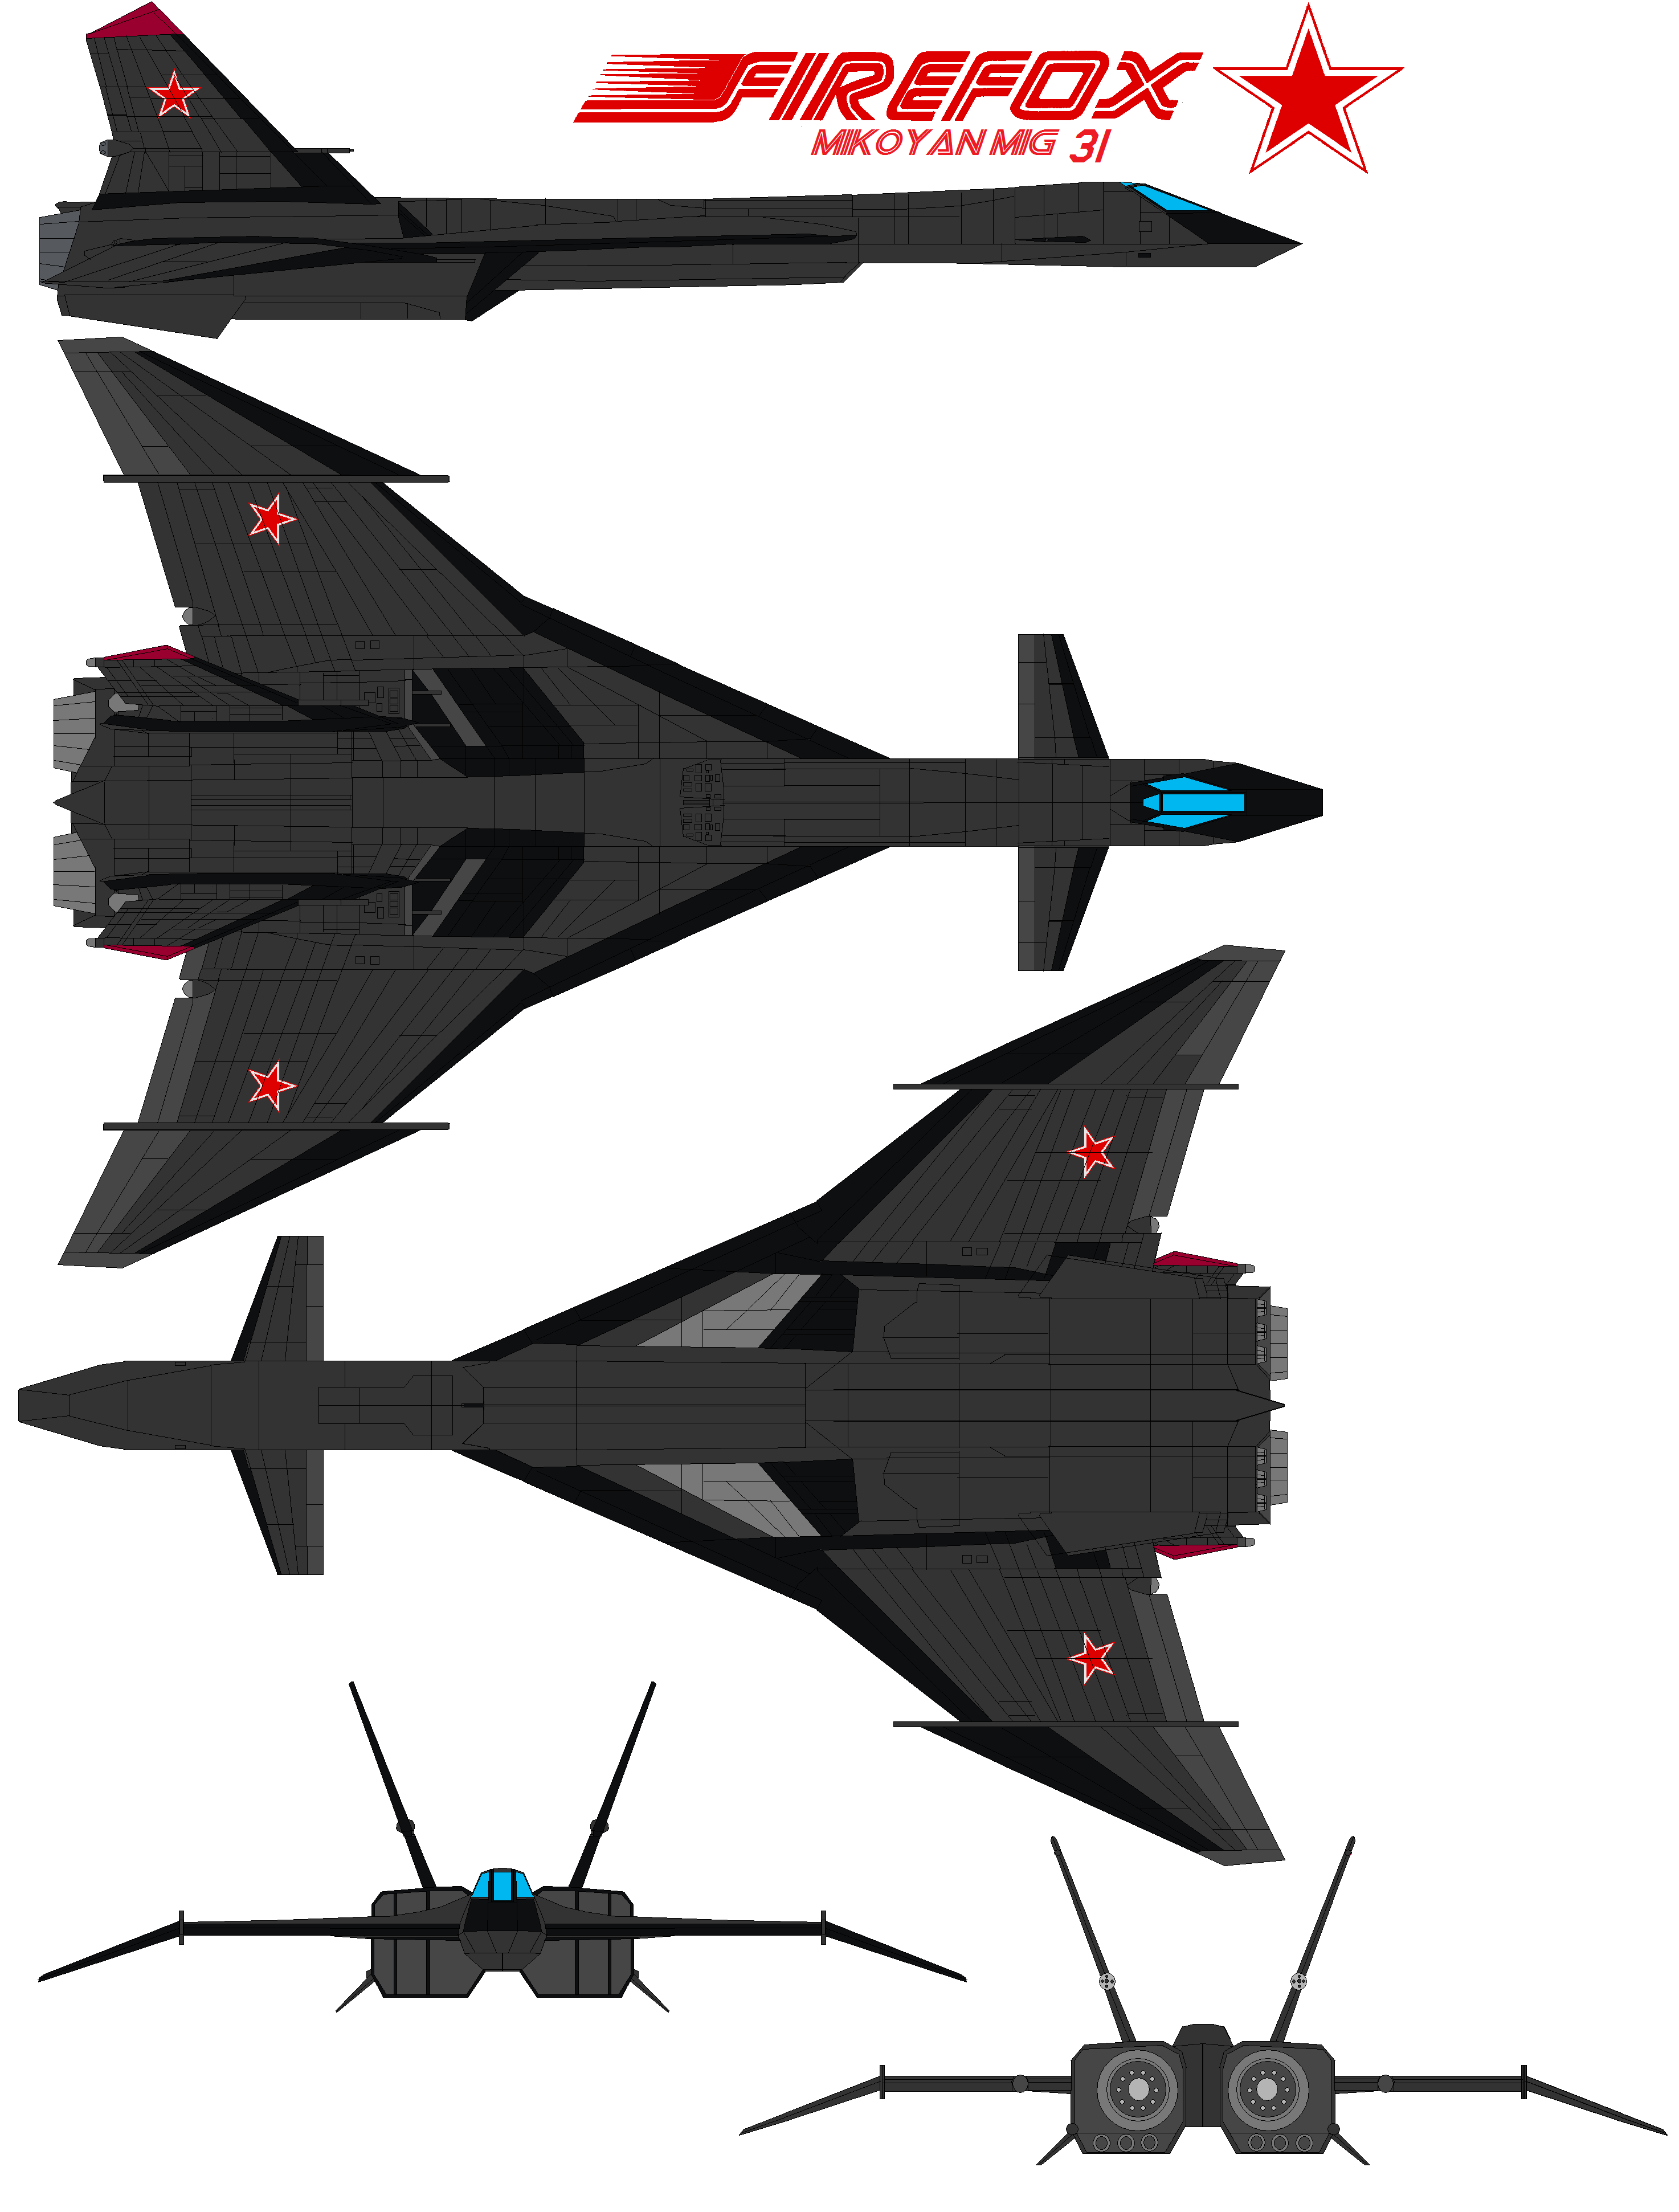 Firefox mig-31 aircraft 2